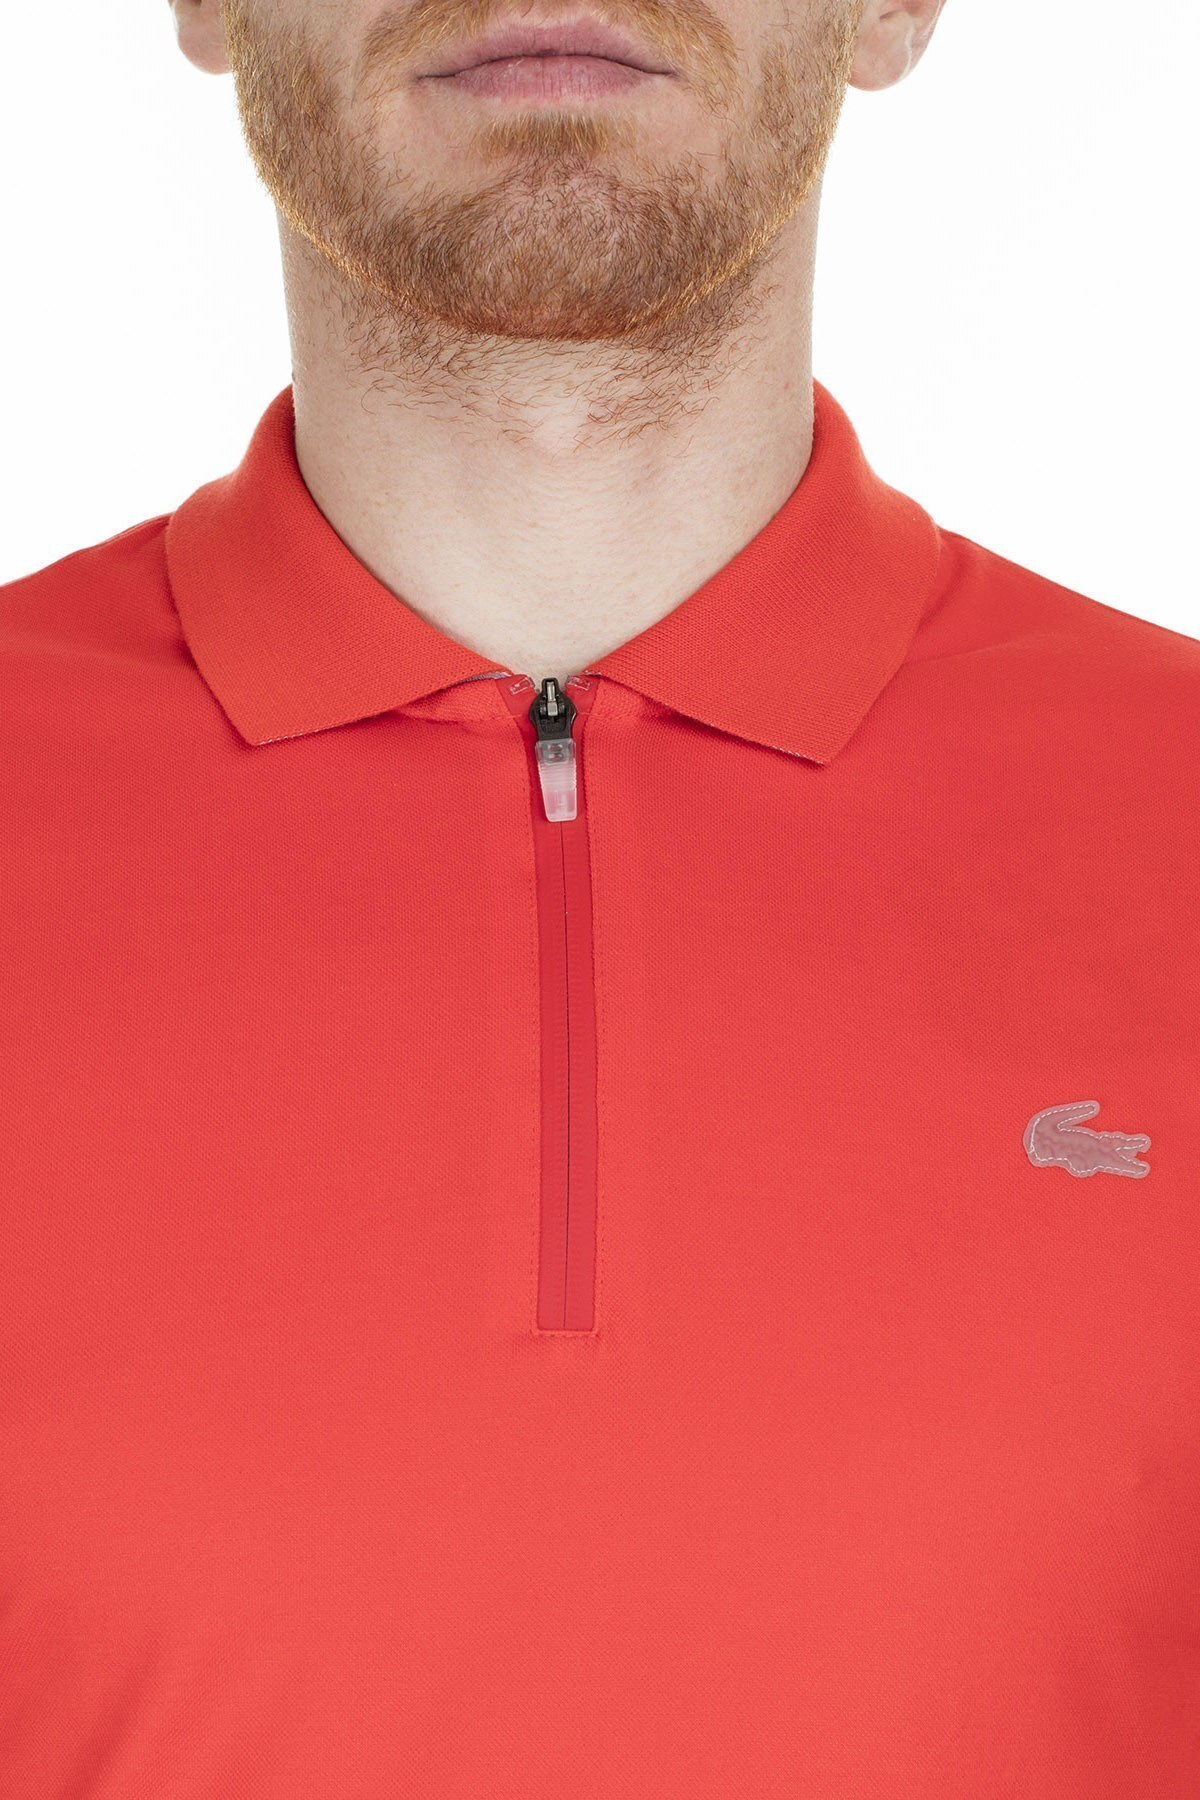 Lacoste Slim Fit T Shirt Erkek Polo PH5109 TS3 KIRMIZI